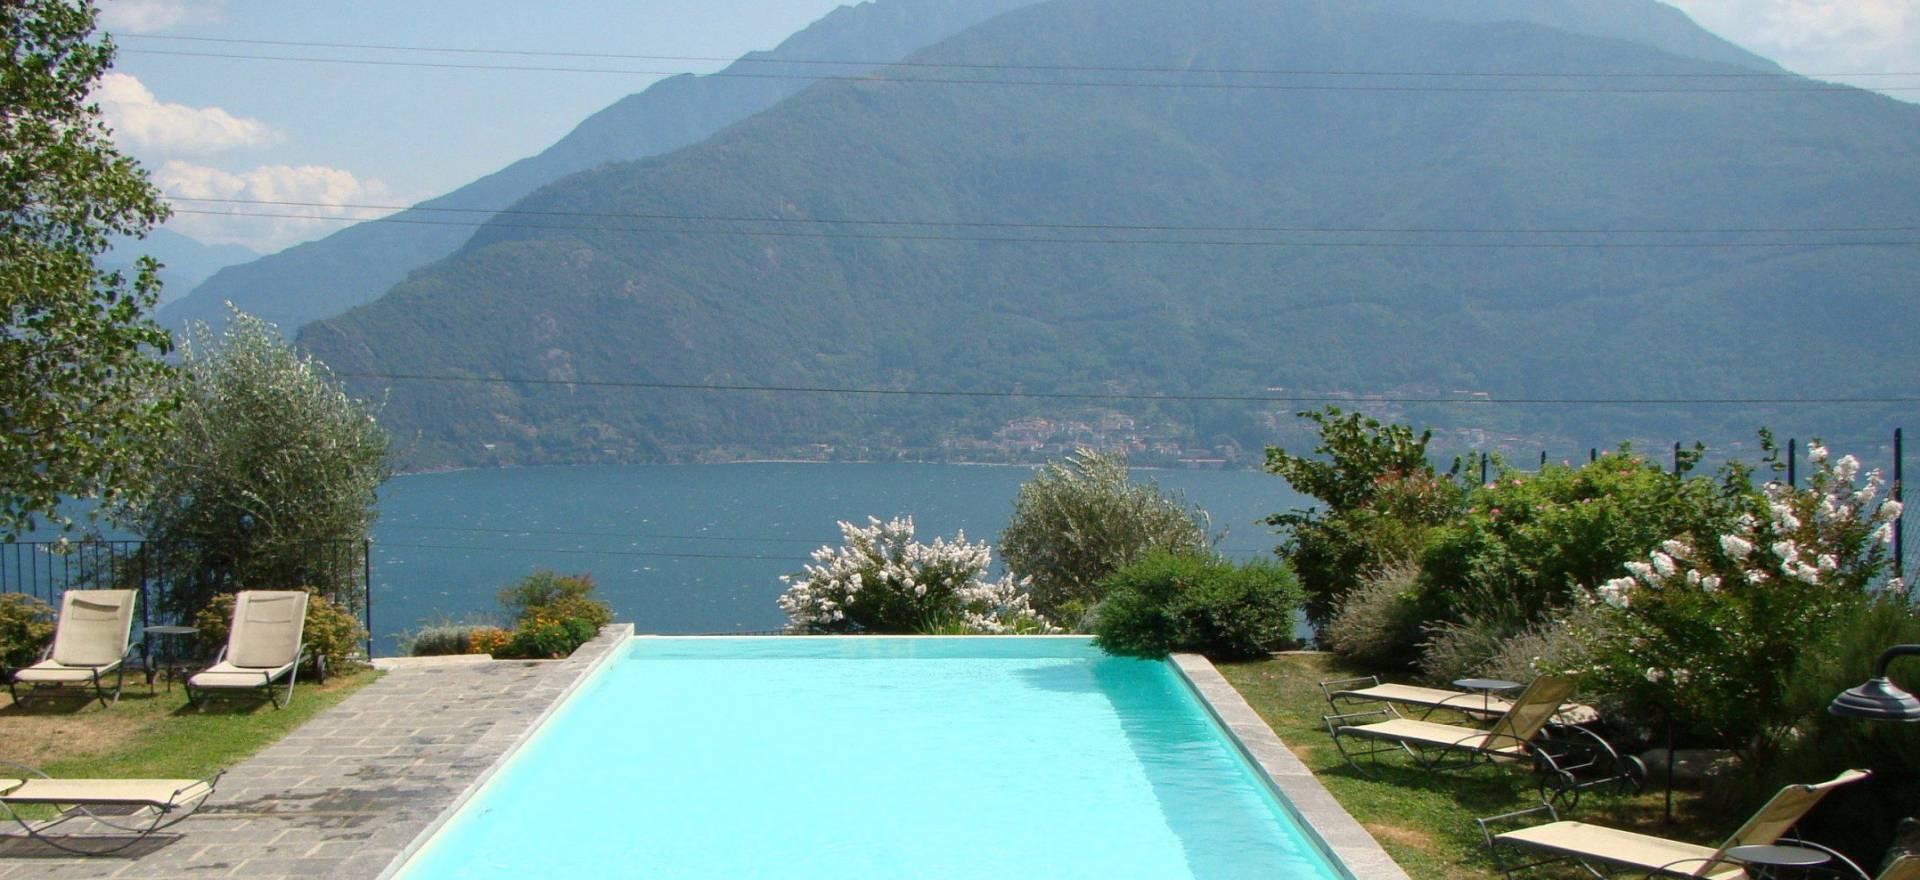 Agriturismo di lusso piscina vista lago di como for Piscina di lusso